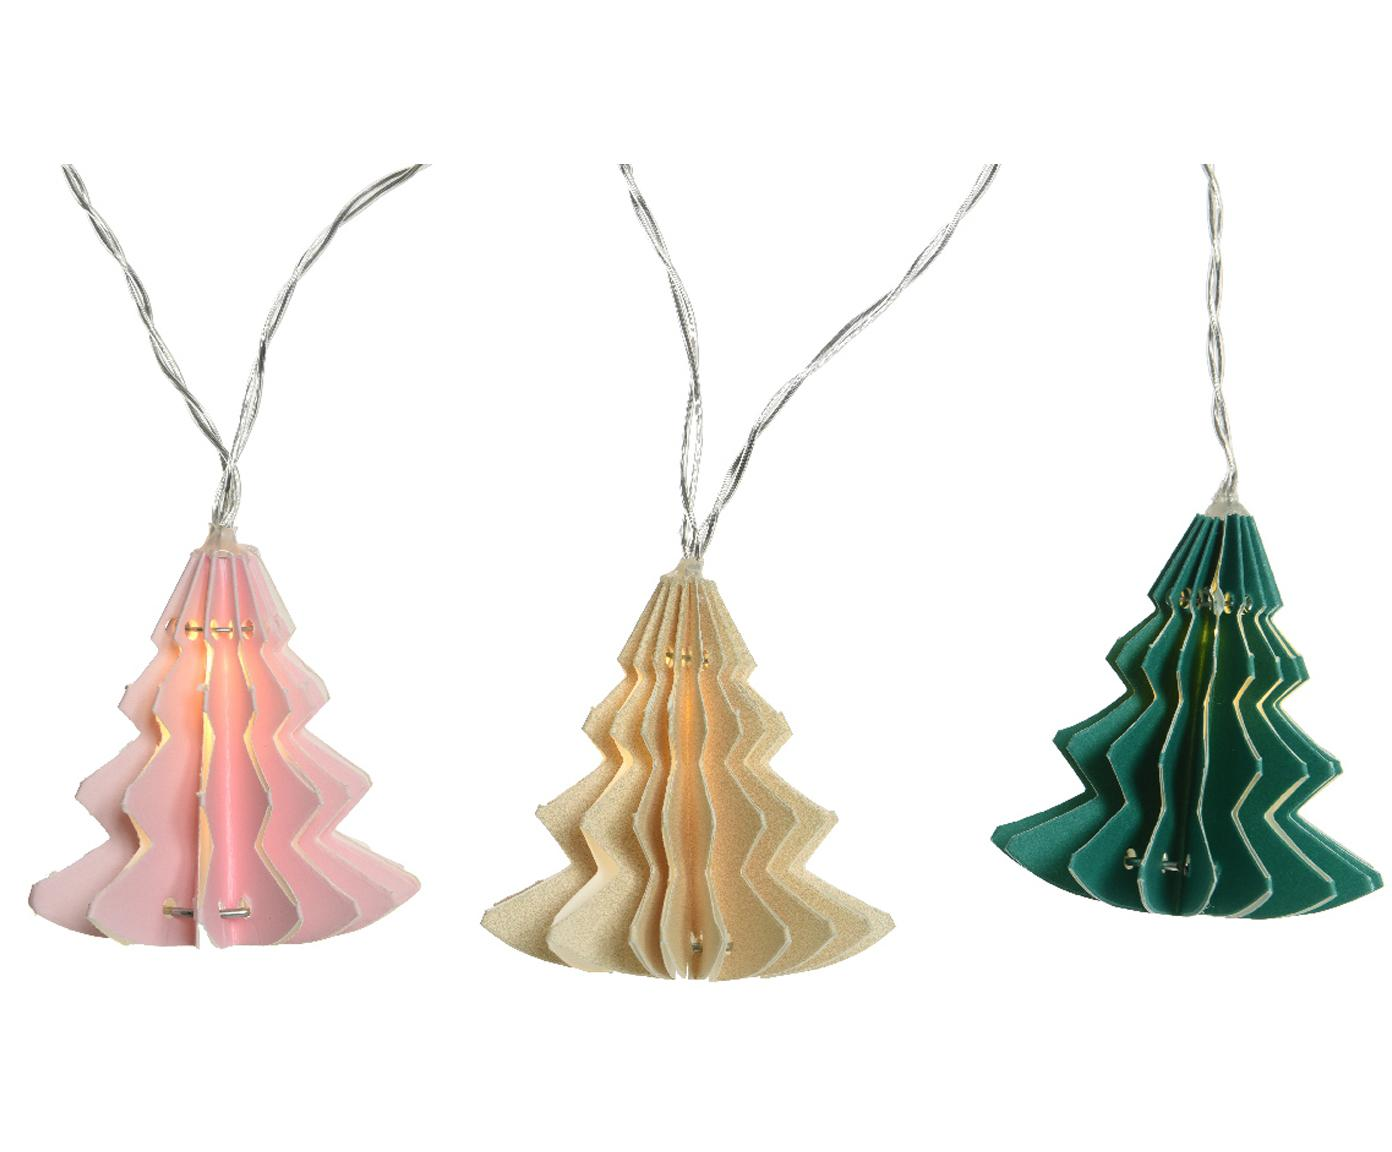 LED Lichterkette Trees, Rosa, Cremefarben, Grün, L 220 cm